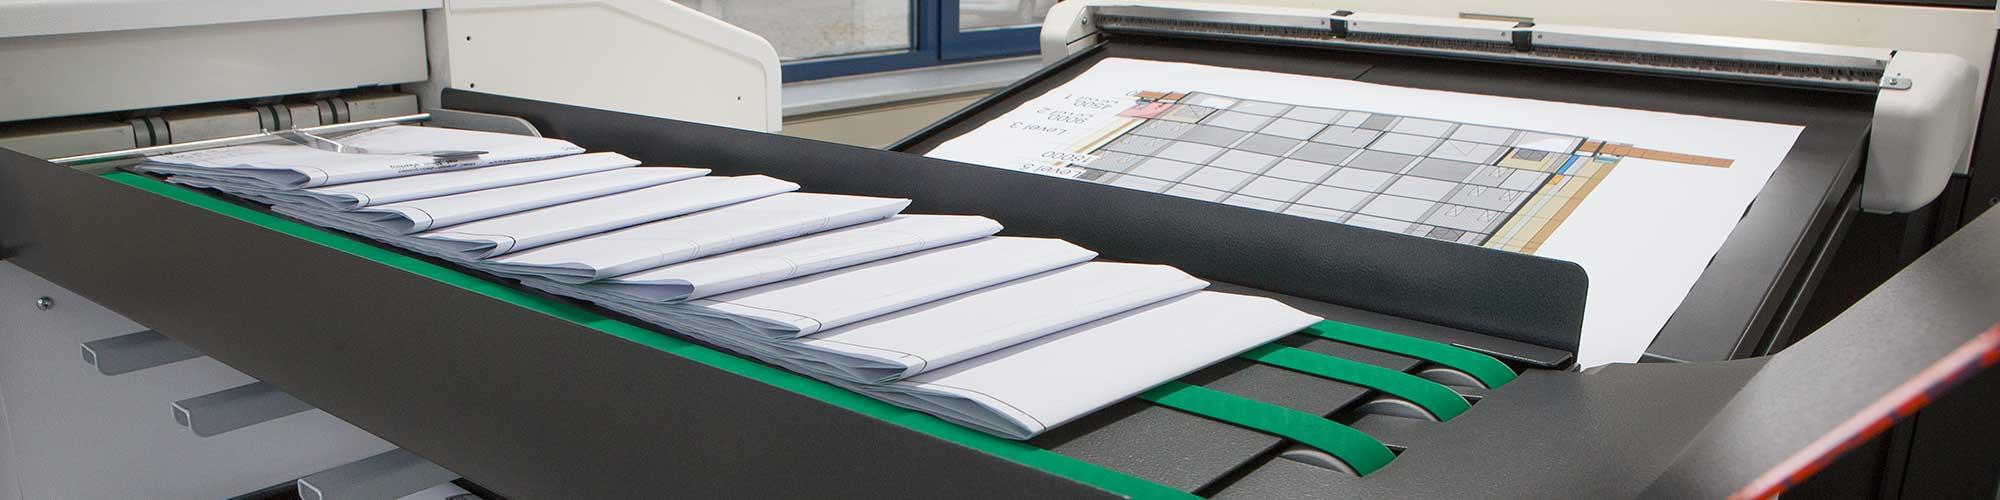 pre-print mail print & copy